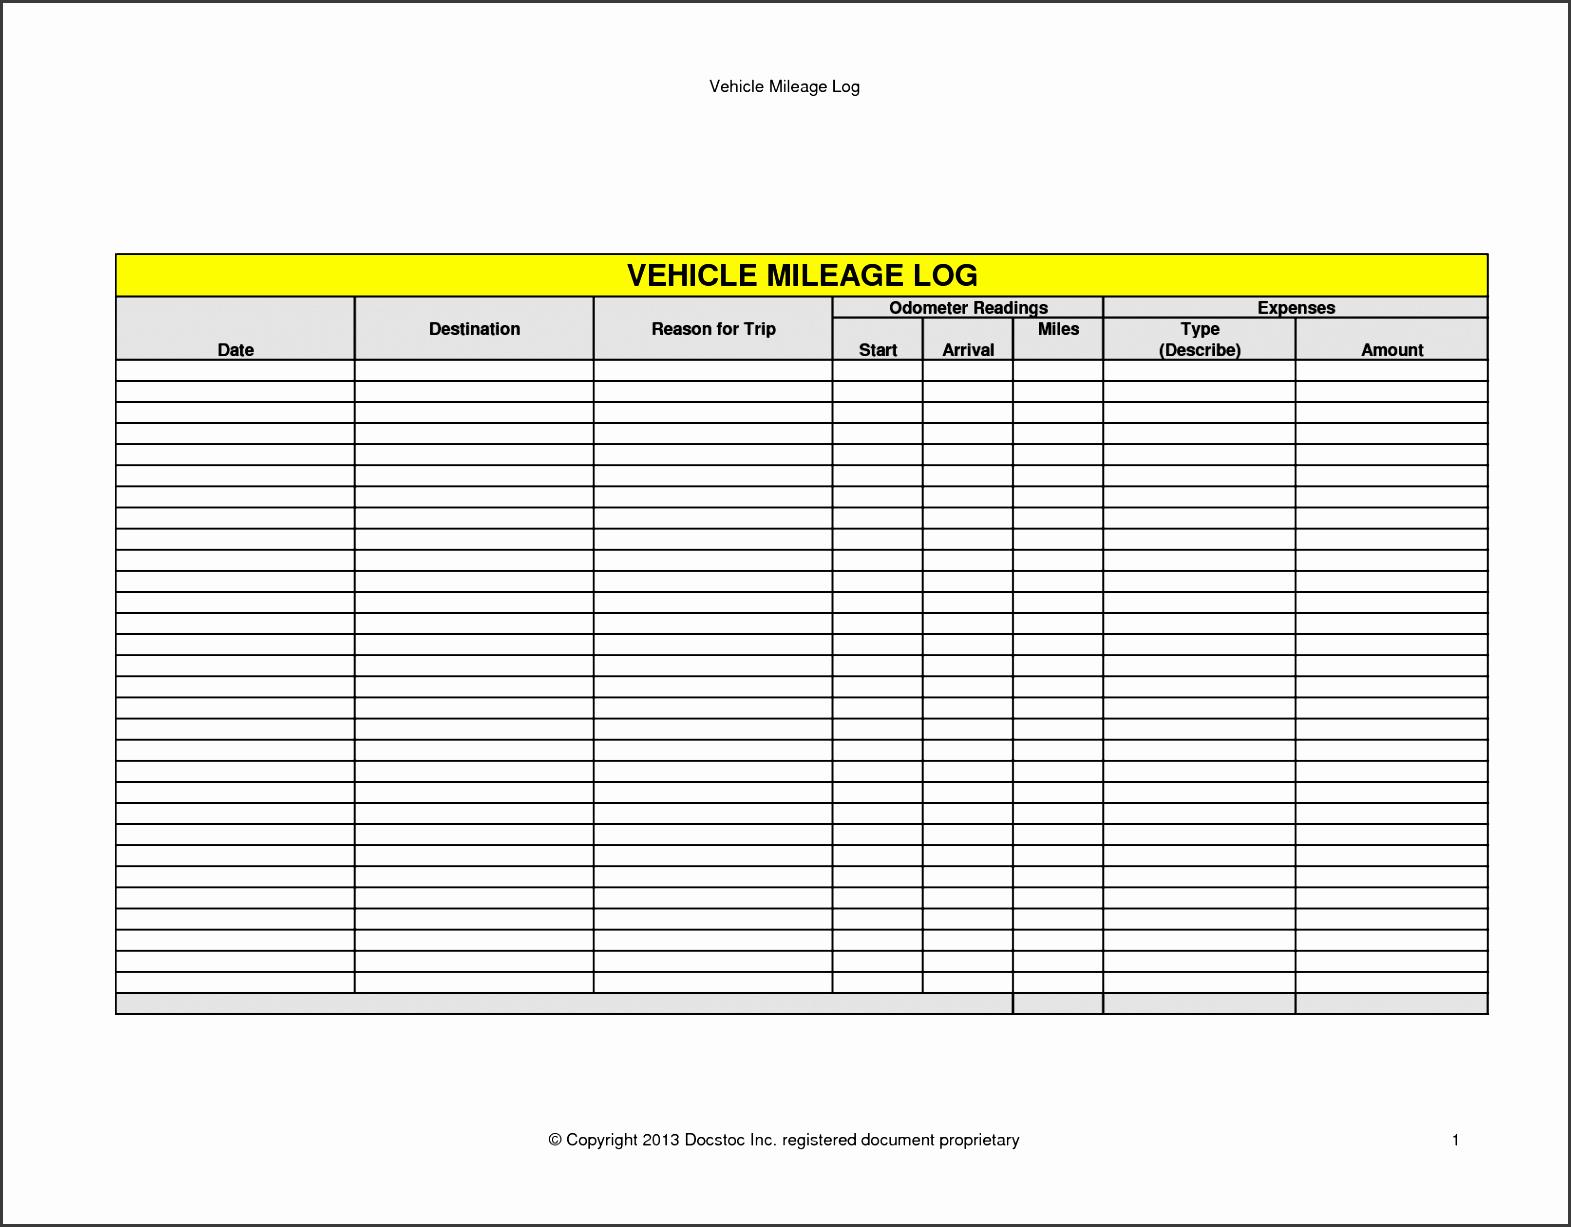 5+ How to Make Vehicle Mileage Log - SampleTemplatess ...